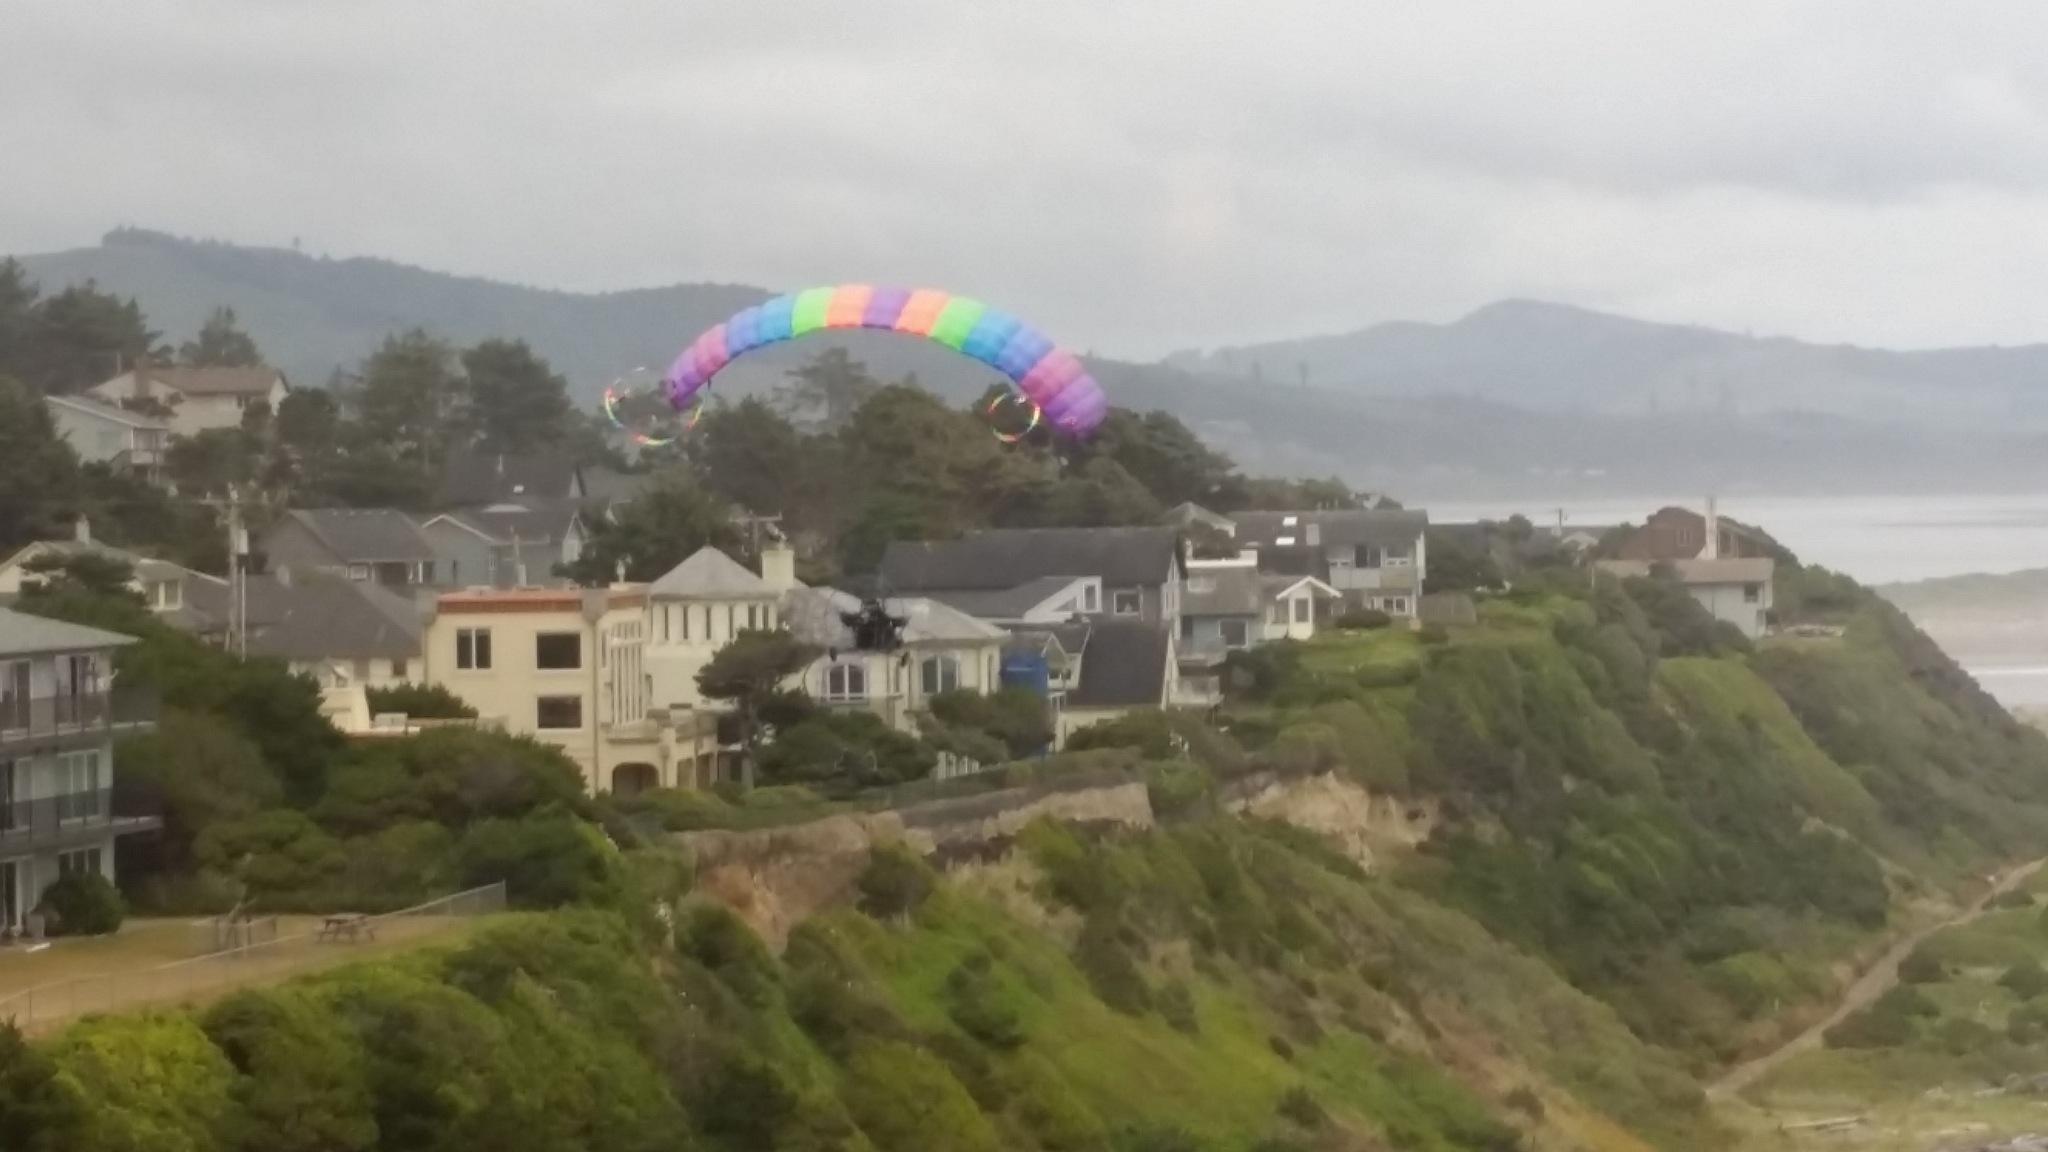 Motorized hang gliding Oregon coast Lincoln City by B56